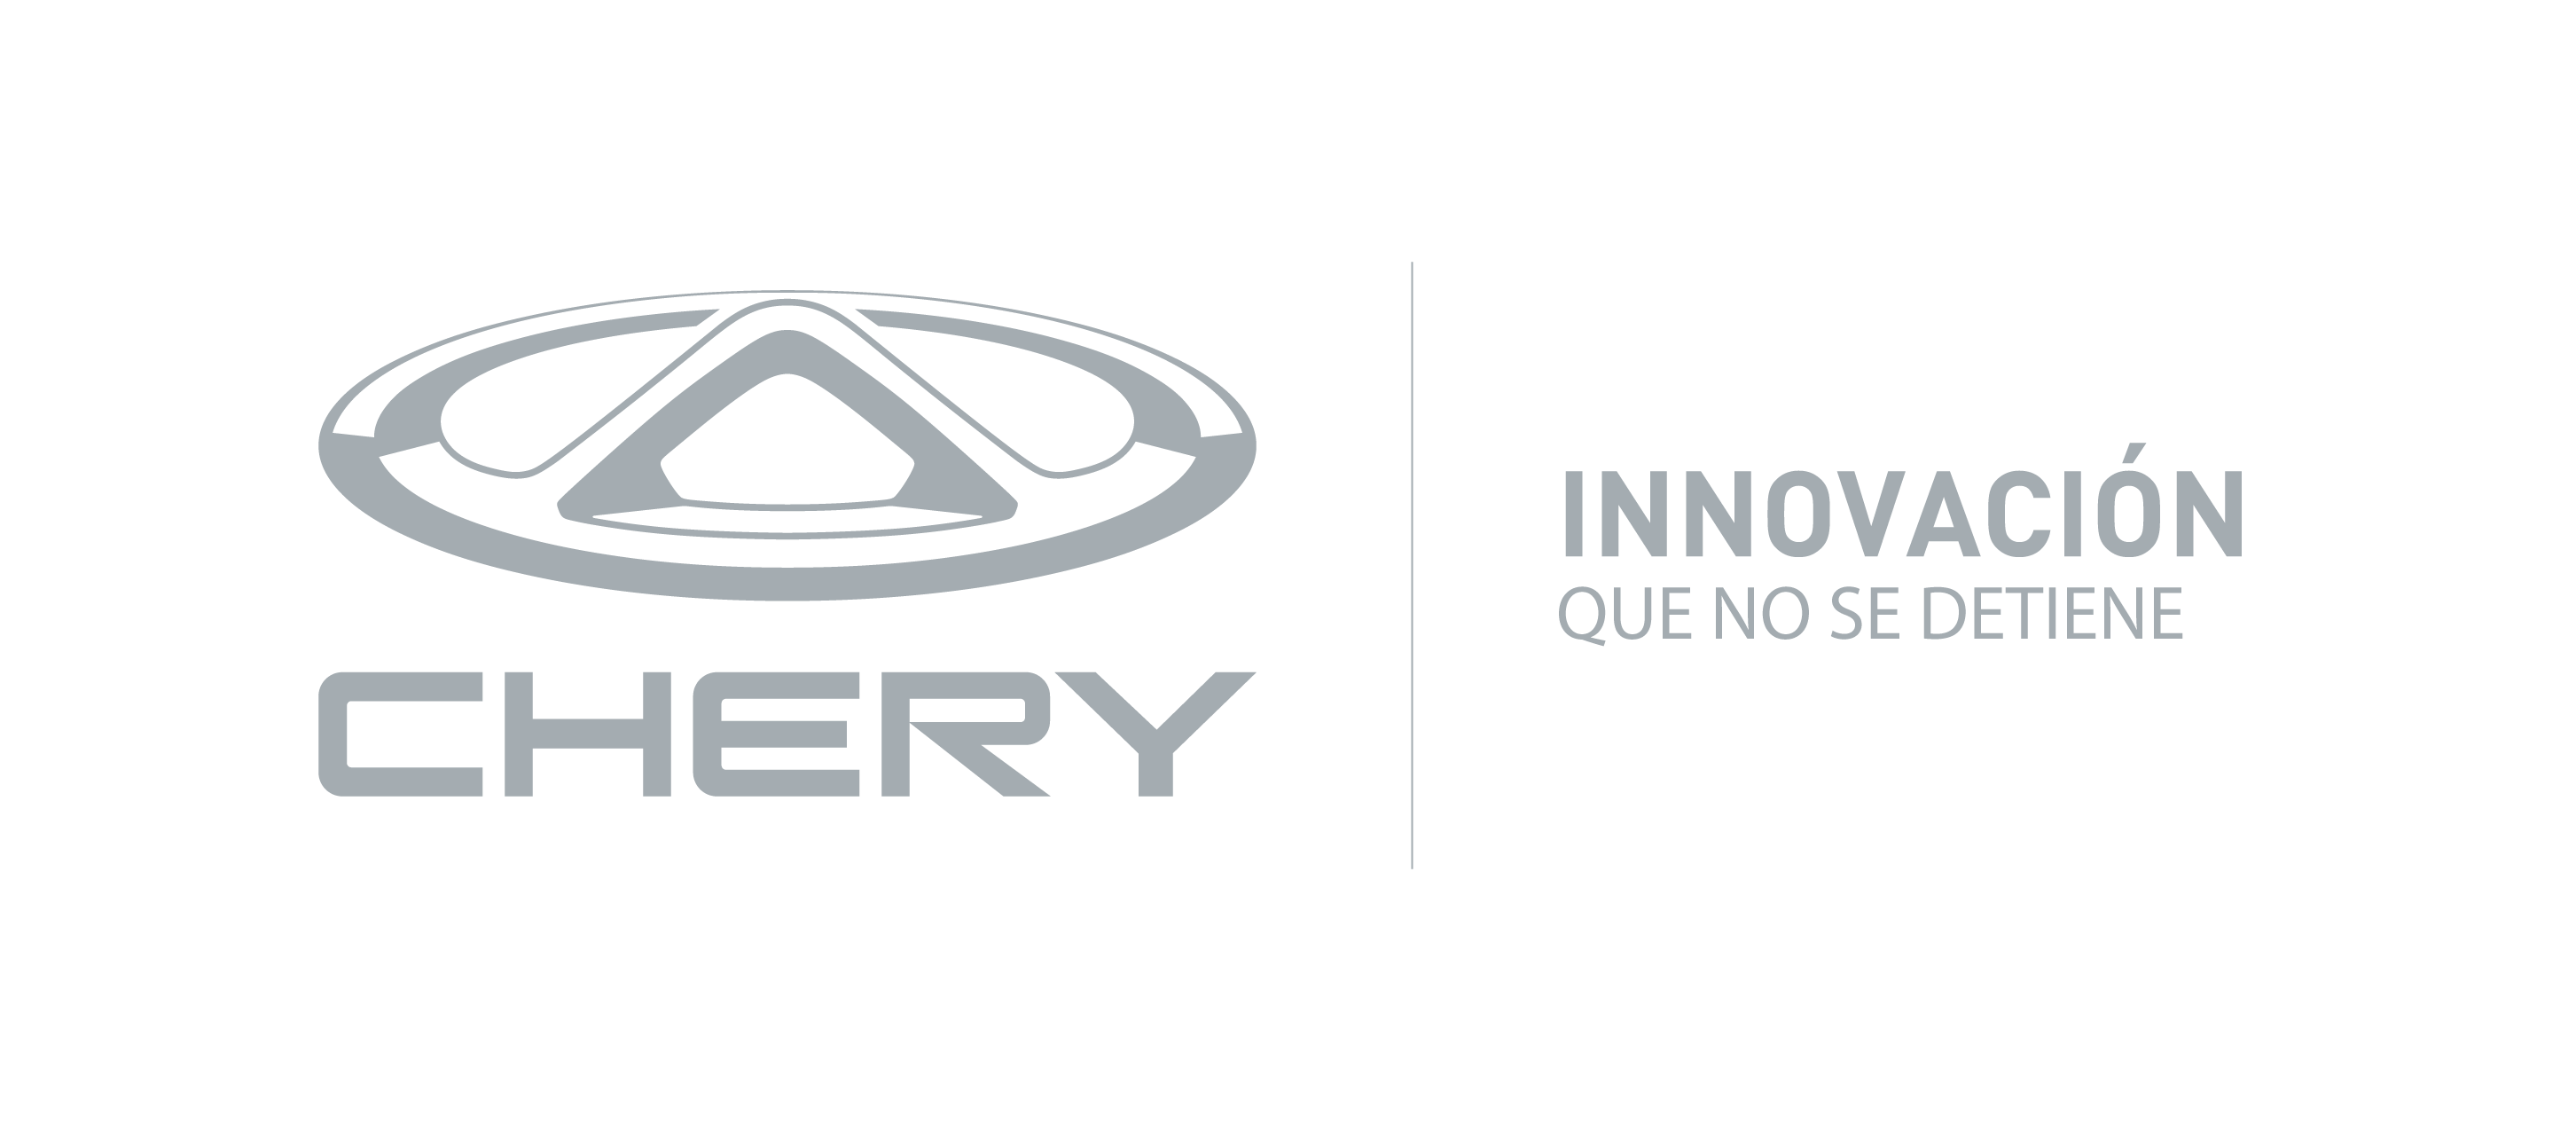 slogan 2020 innovacion-02